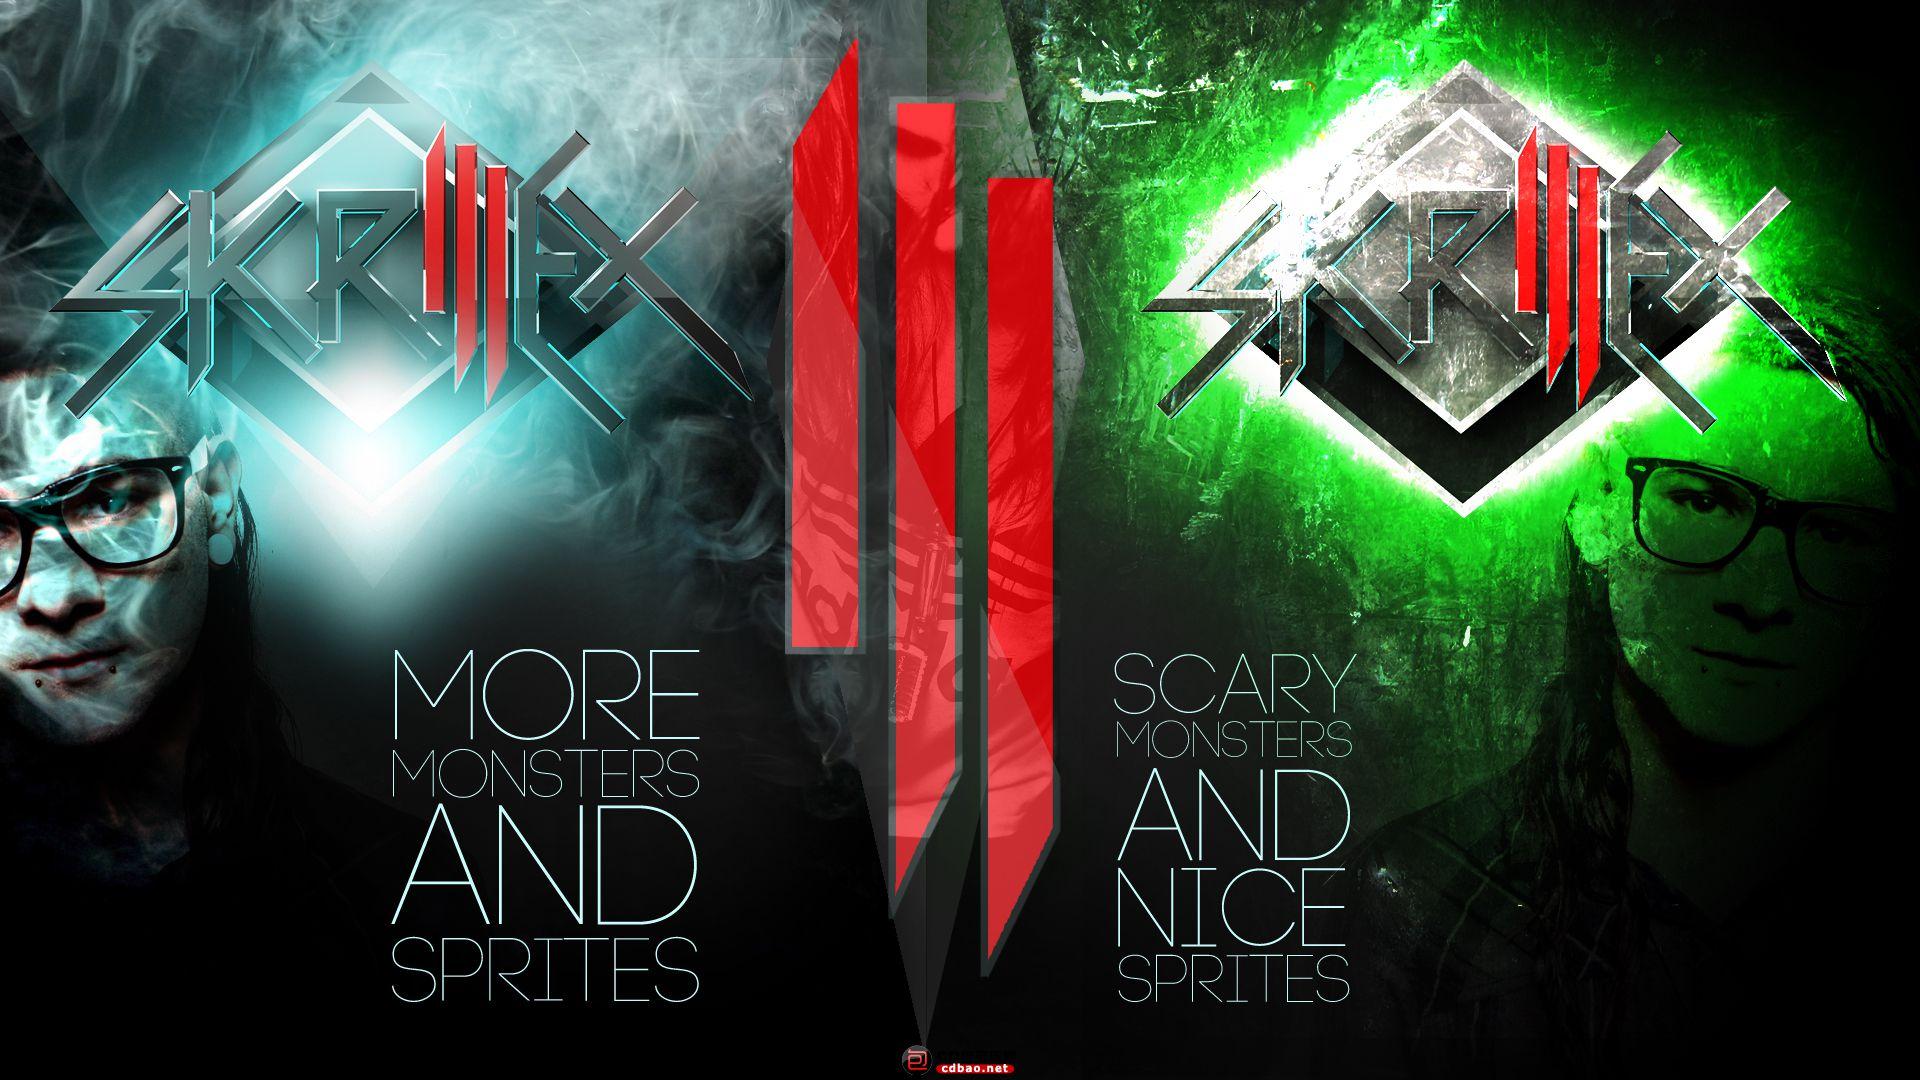 Skrillex Wallpaper Scary Monsters And Nice Sprites.jpg